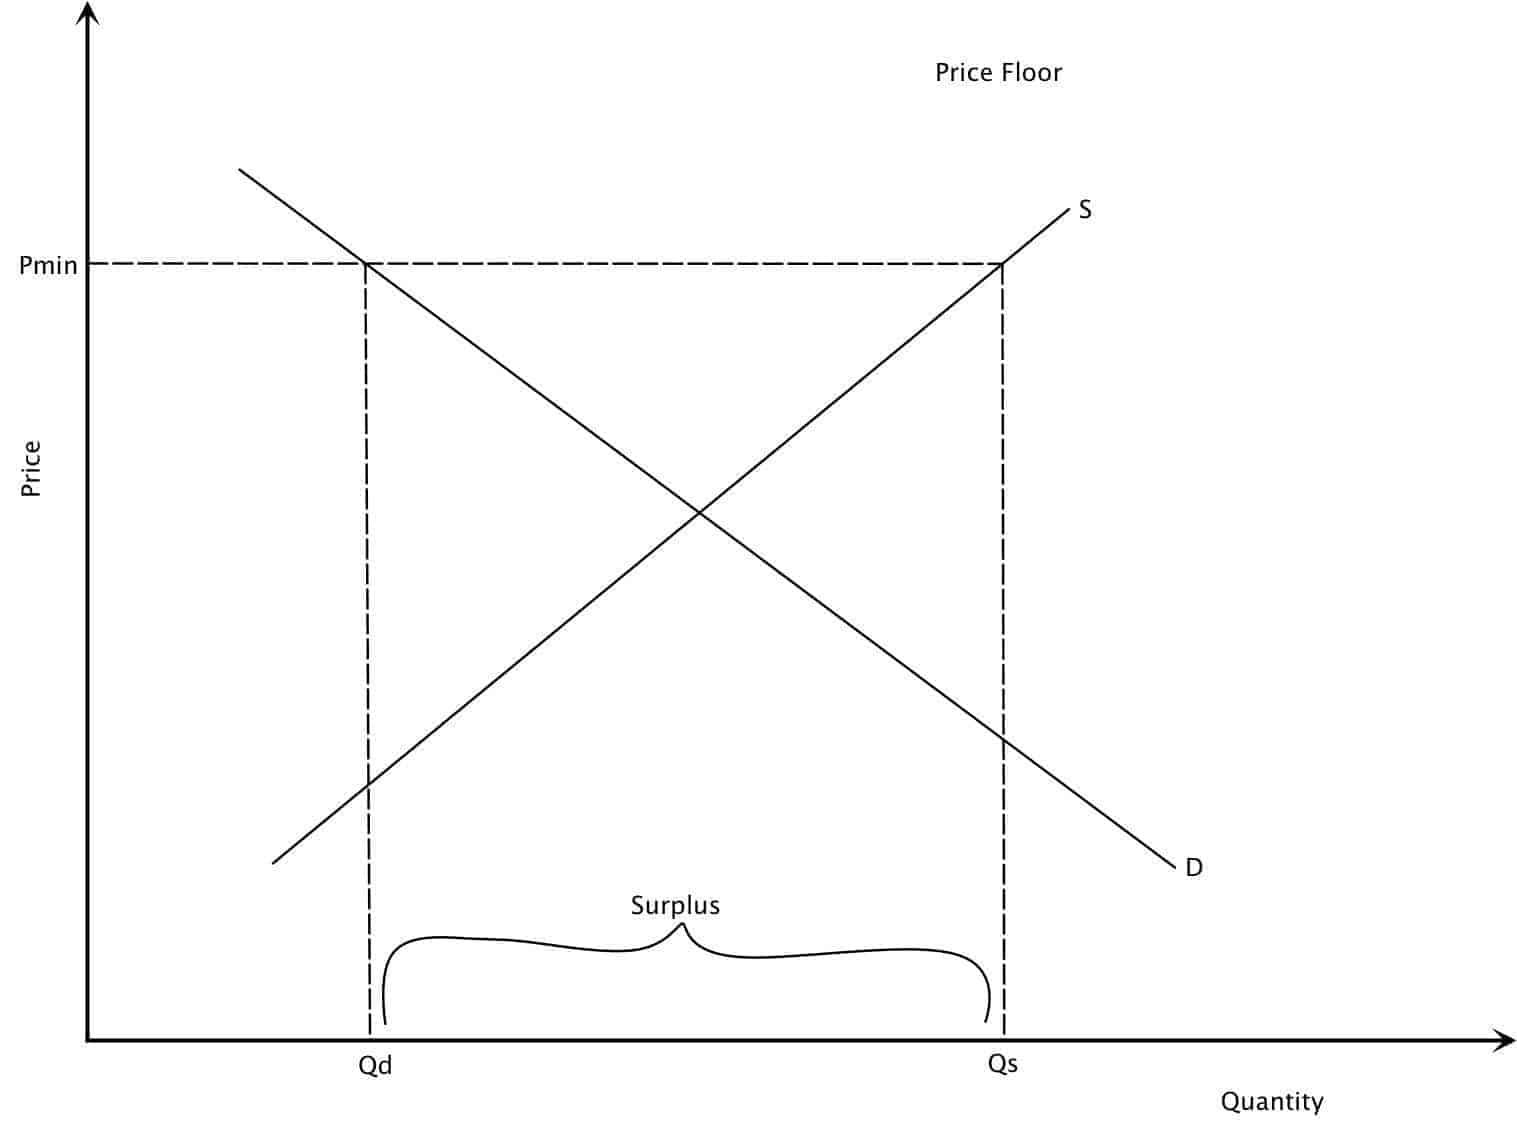 A Price Floor Diagram